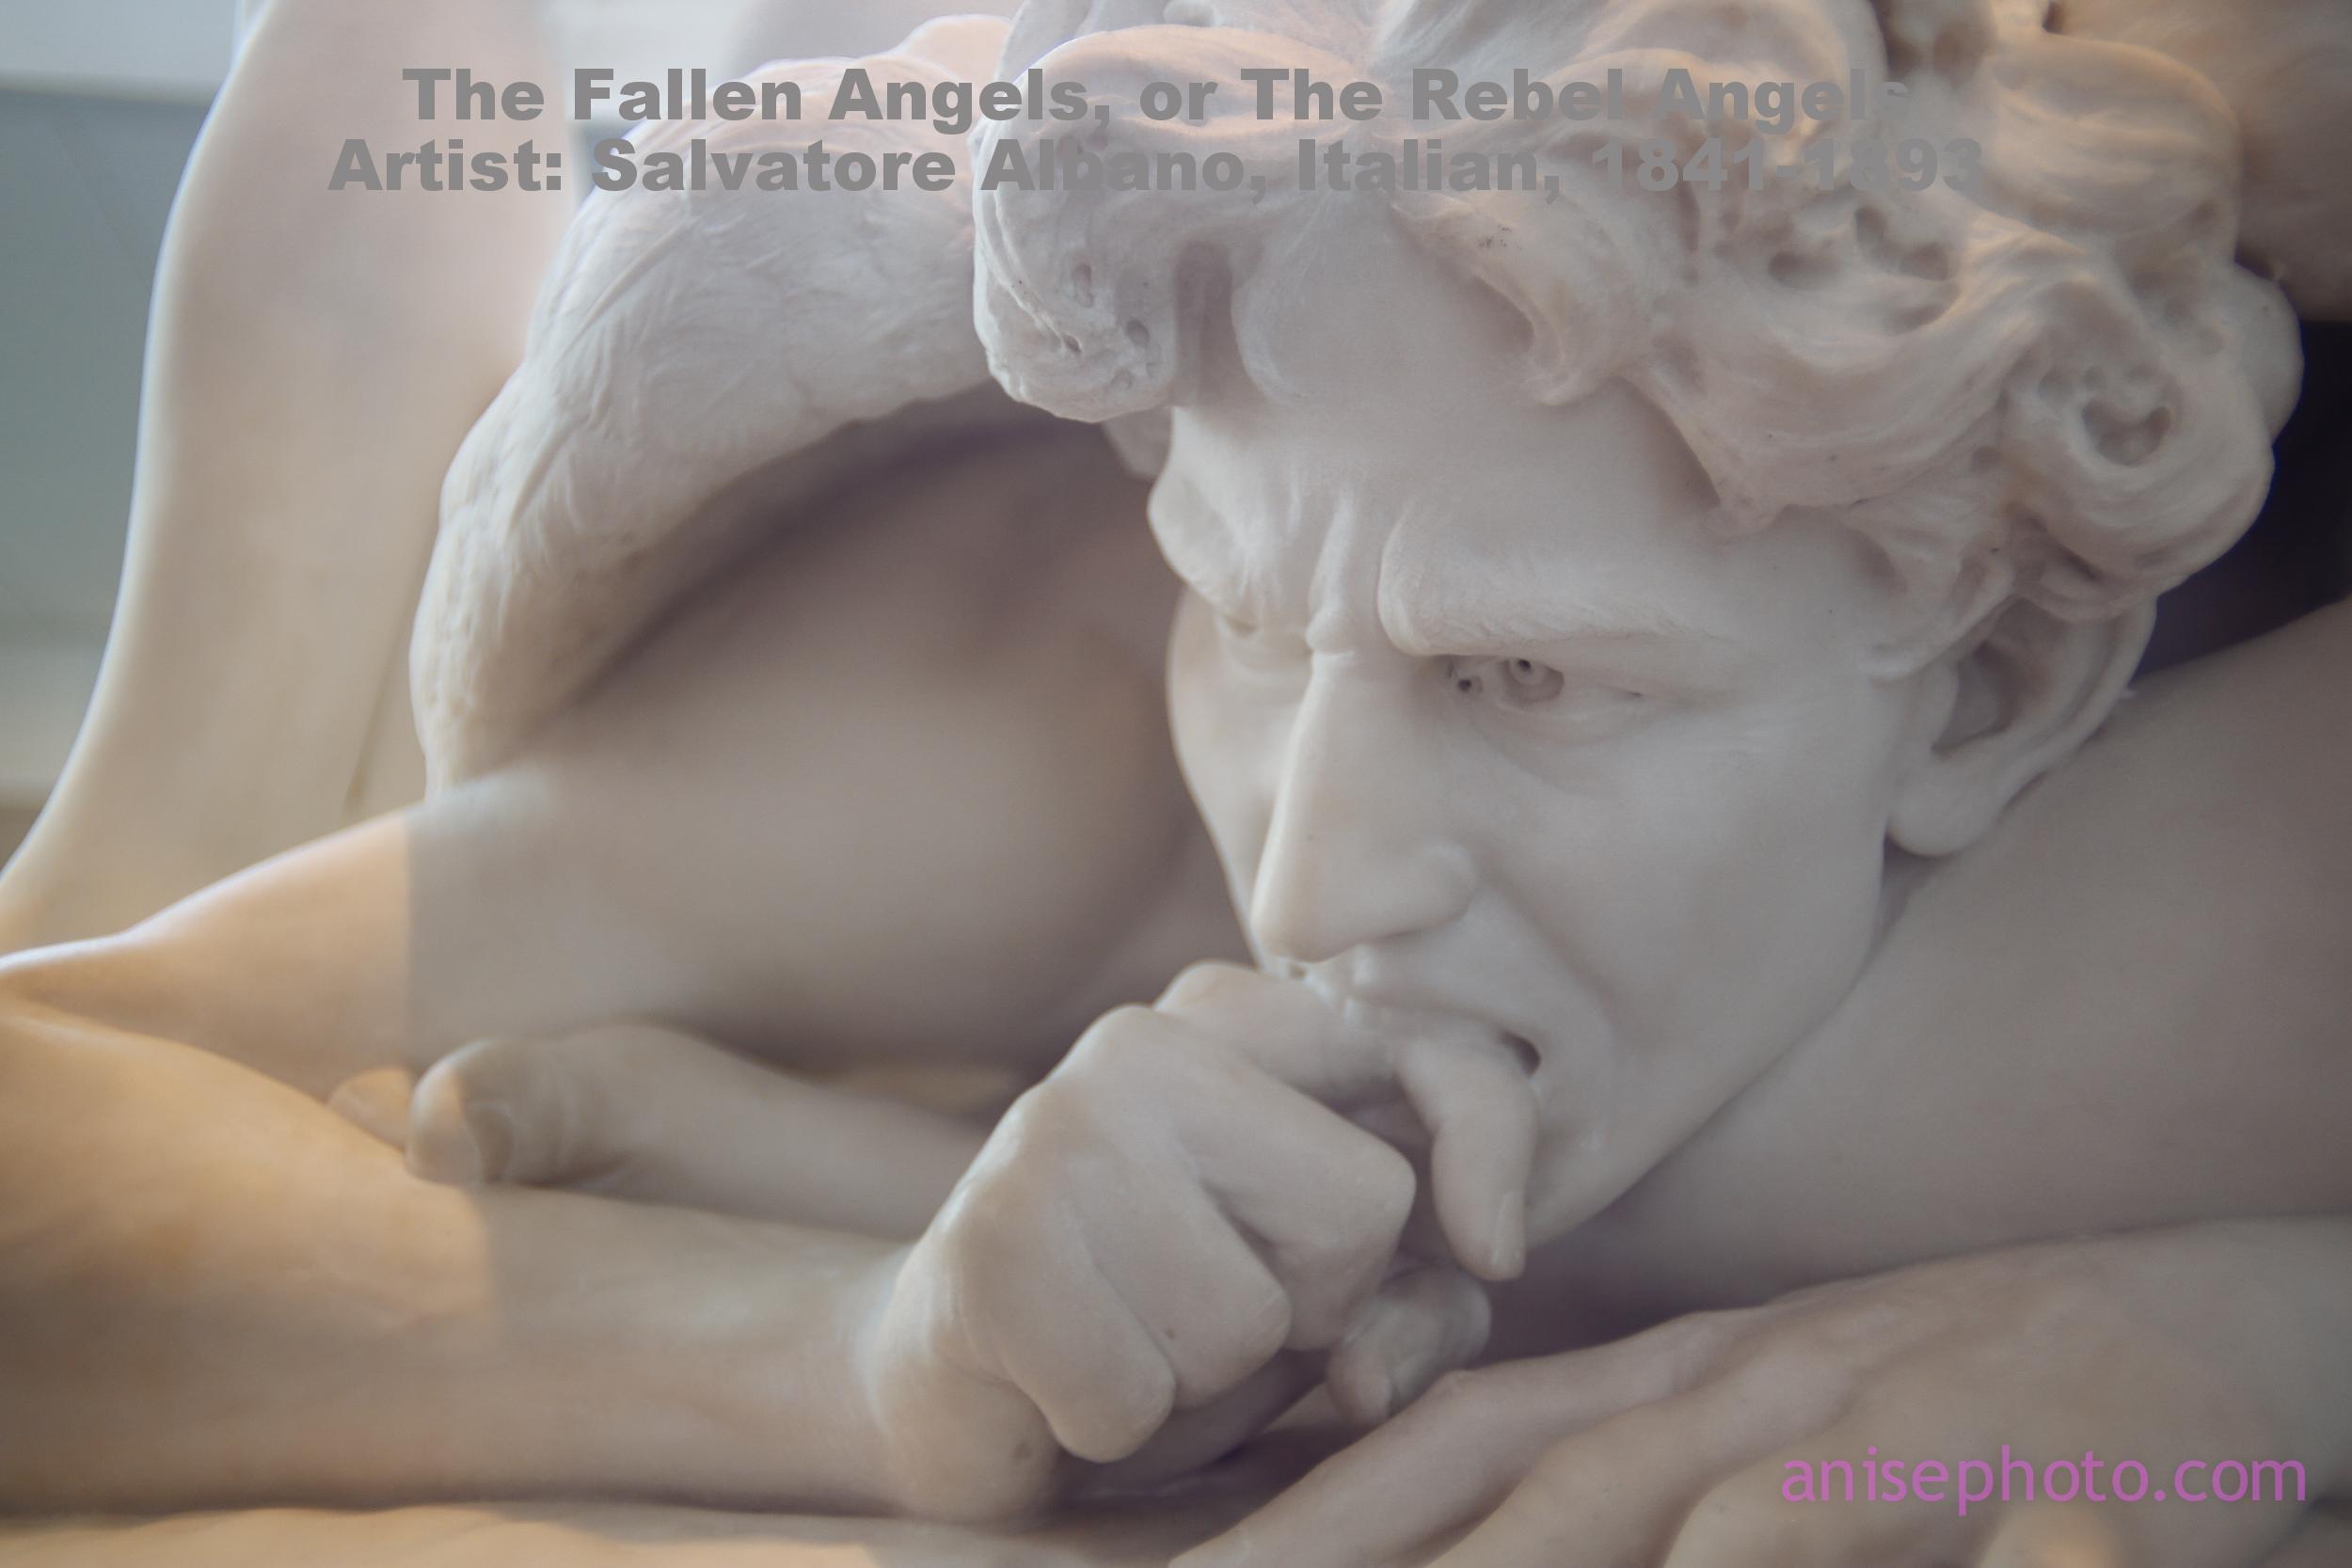 The Fallen Angels, or The Rebel Angels  Artist: Salvatore Albano, Italian, 1841-1893